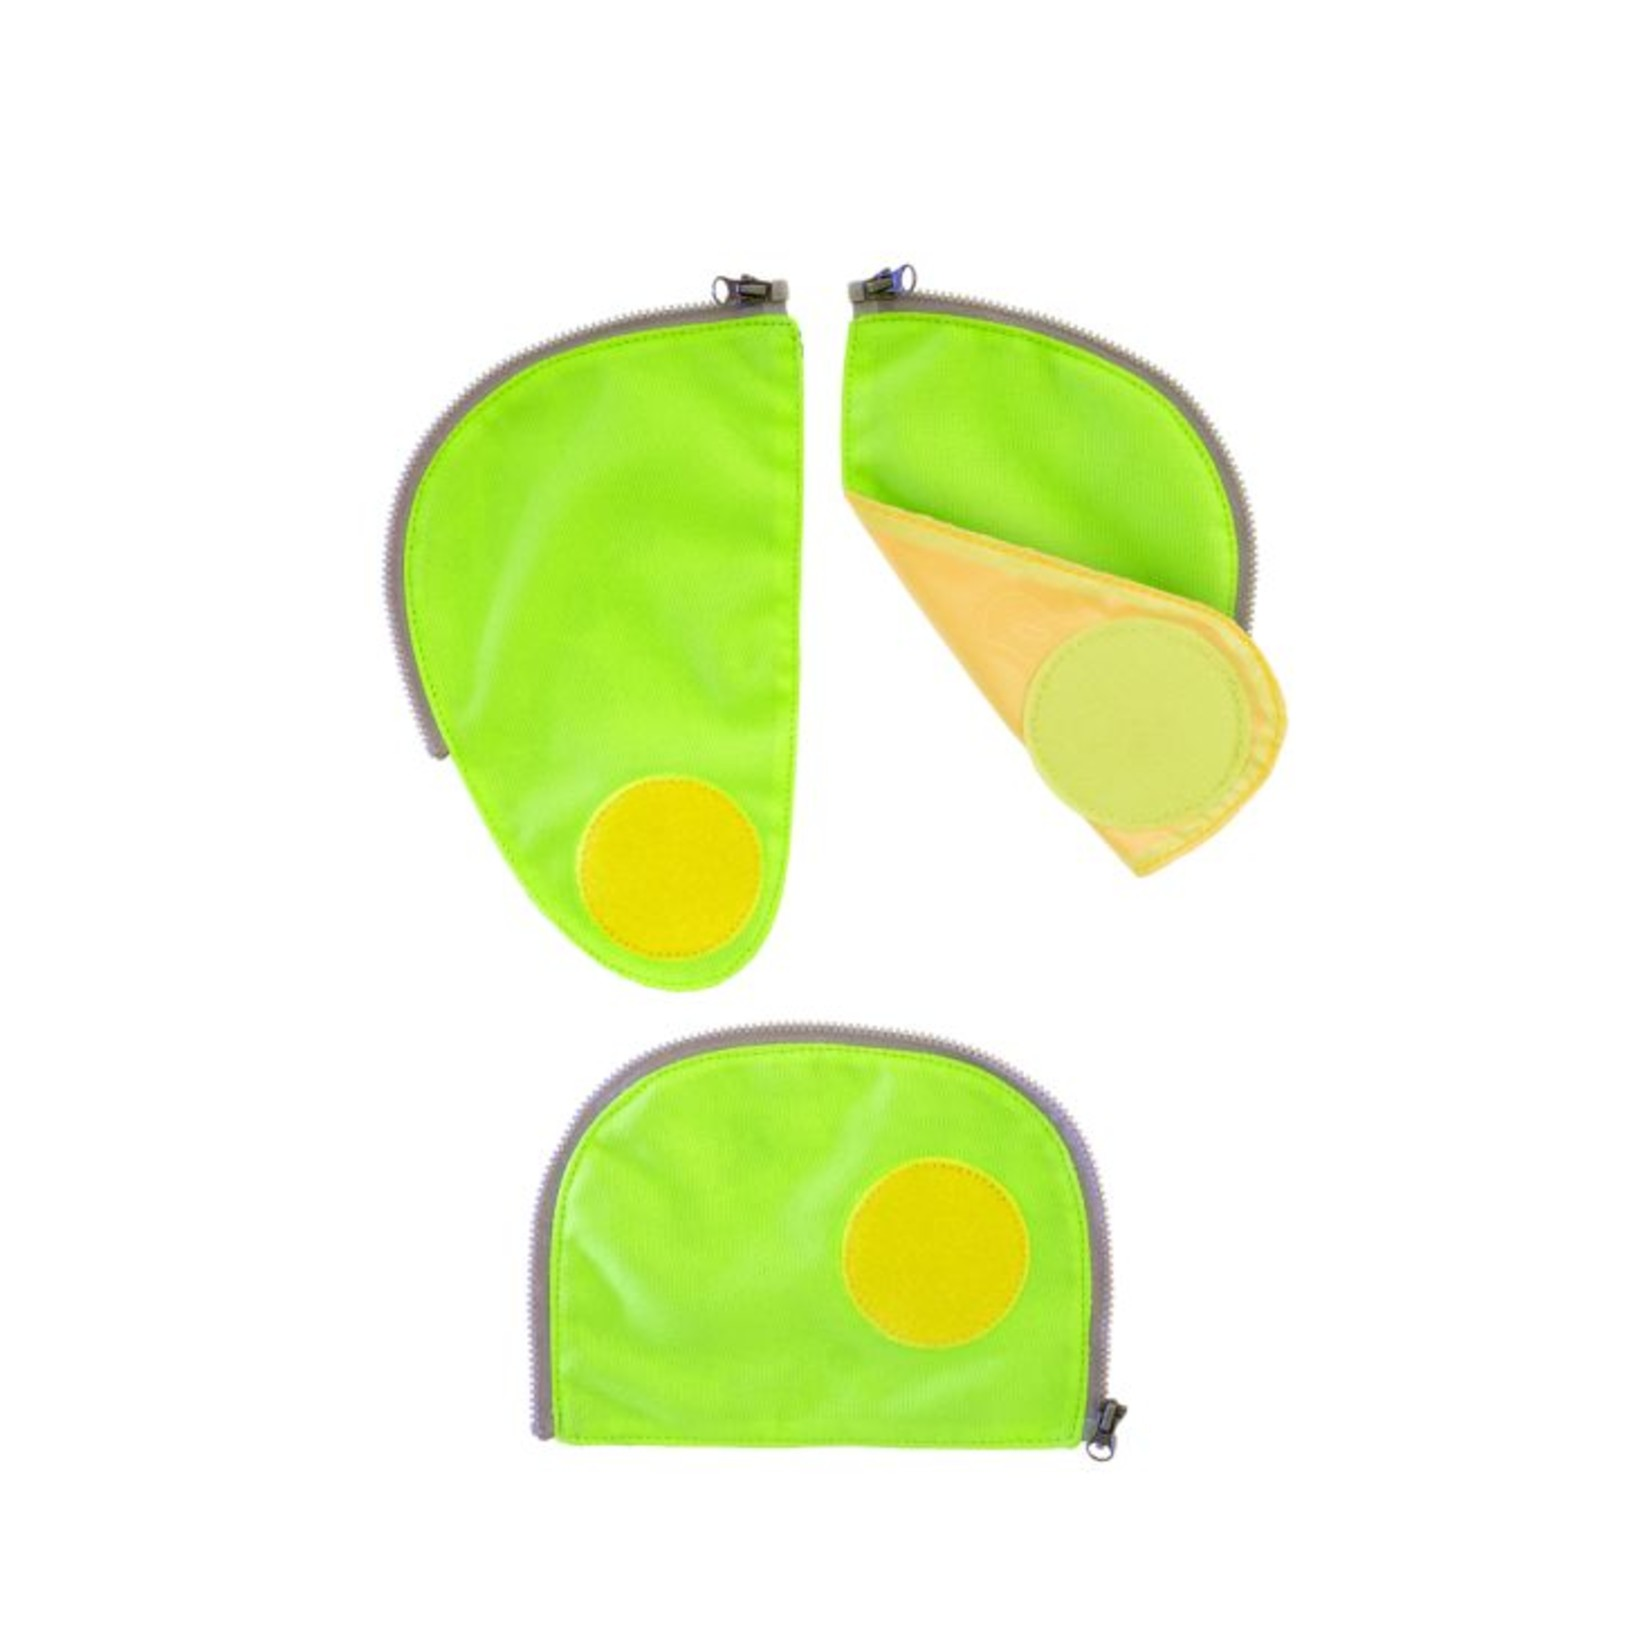 Ergobag Sicherheitsset 3tlg., grün